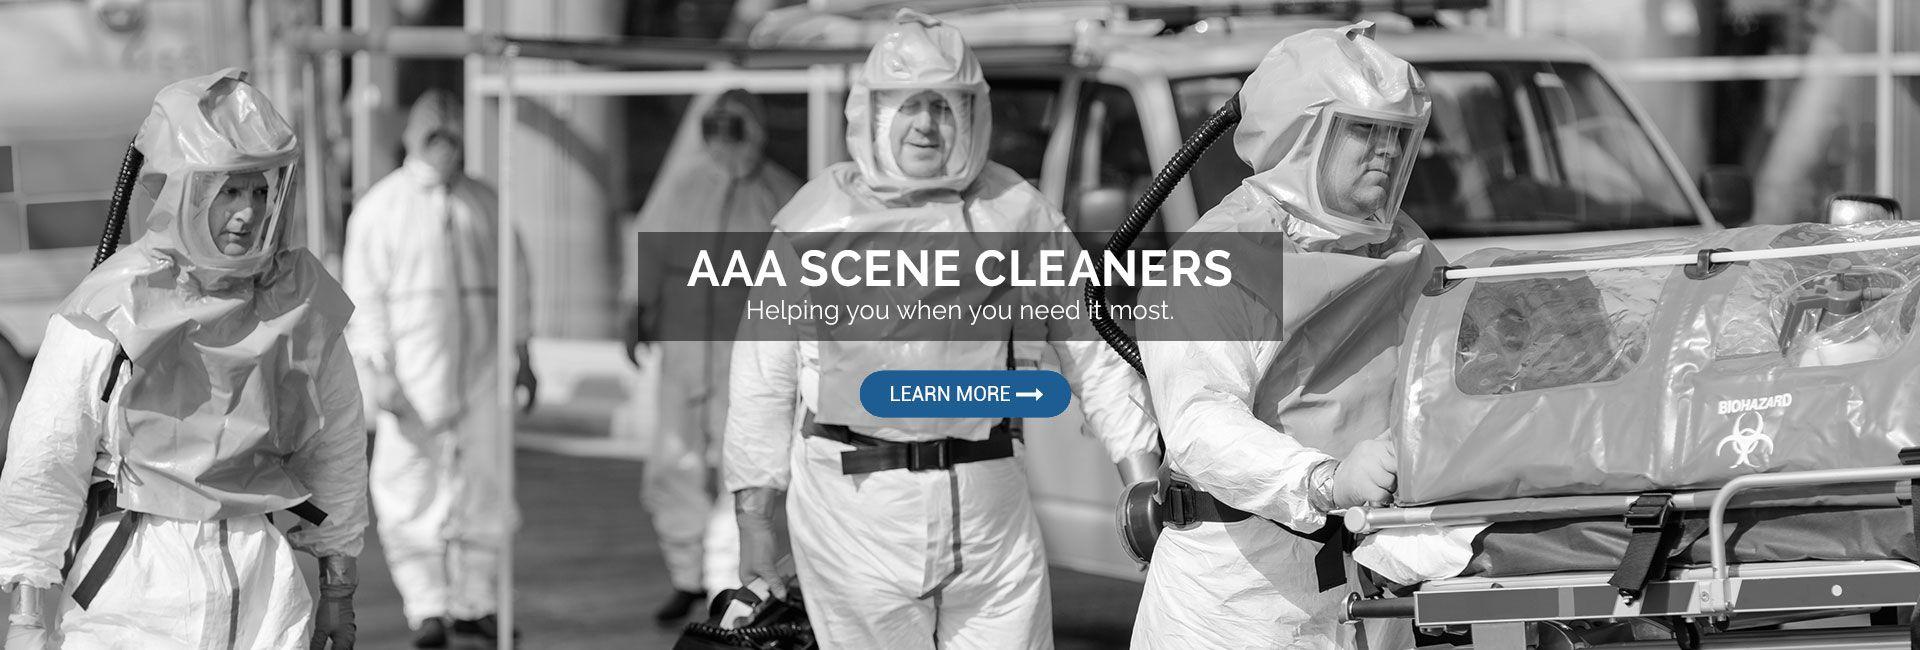 Pin on AAA Scene Cleaners